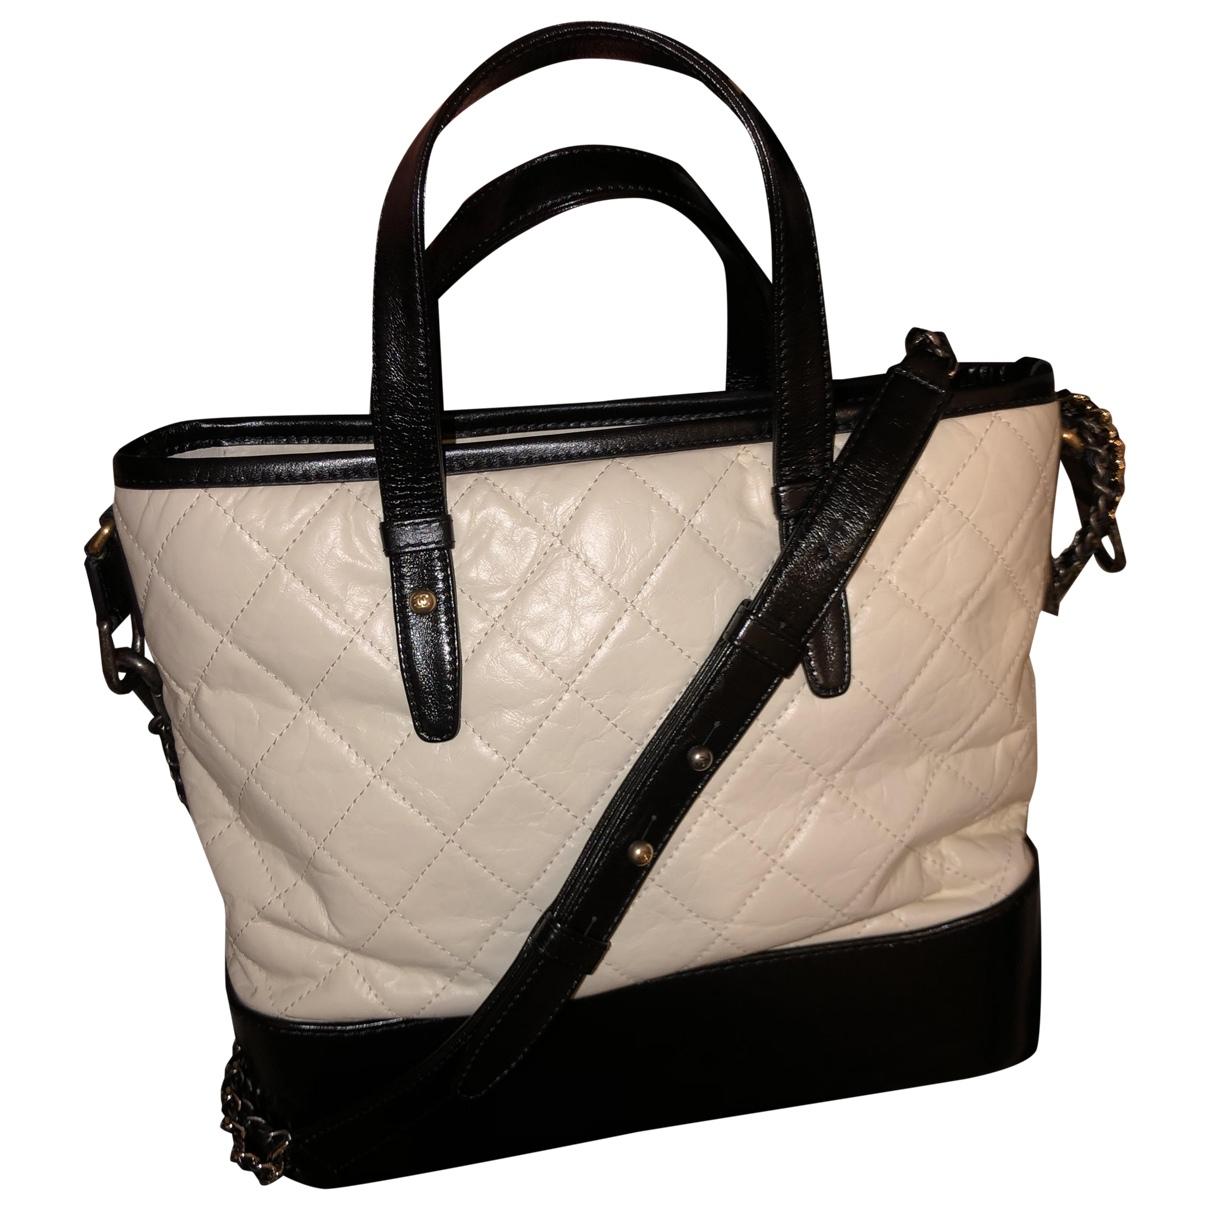 Chanel Gabrielle White Leather handbag for Women N